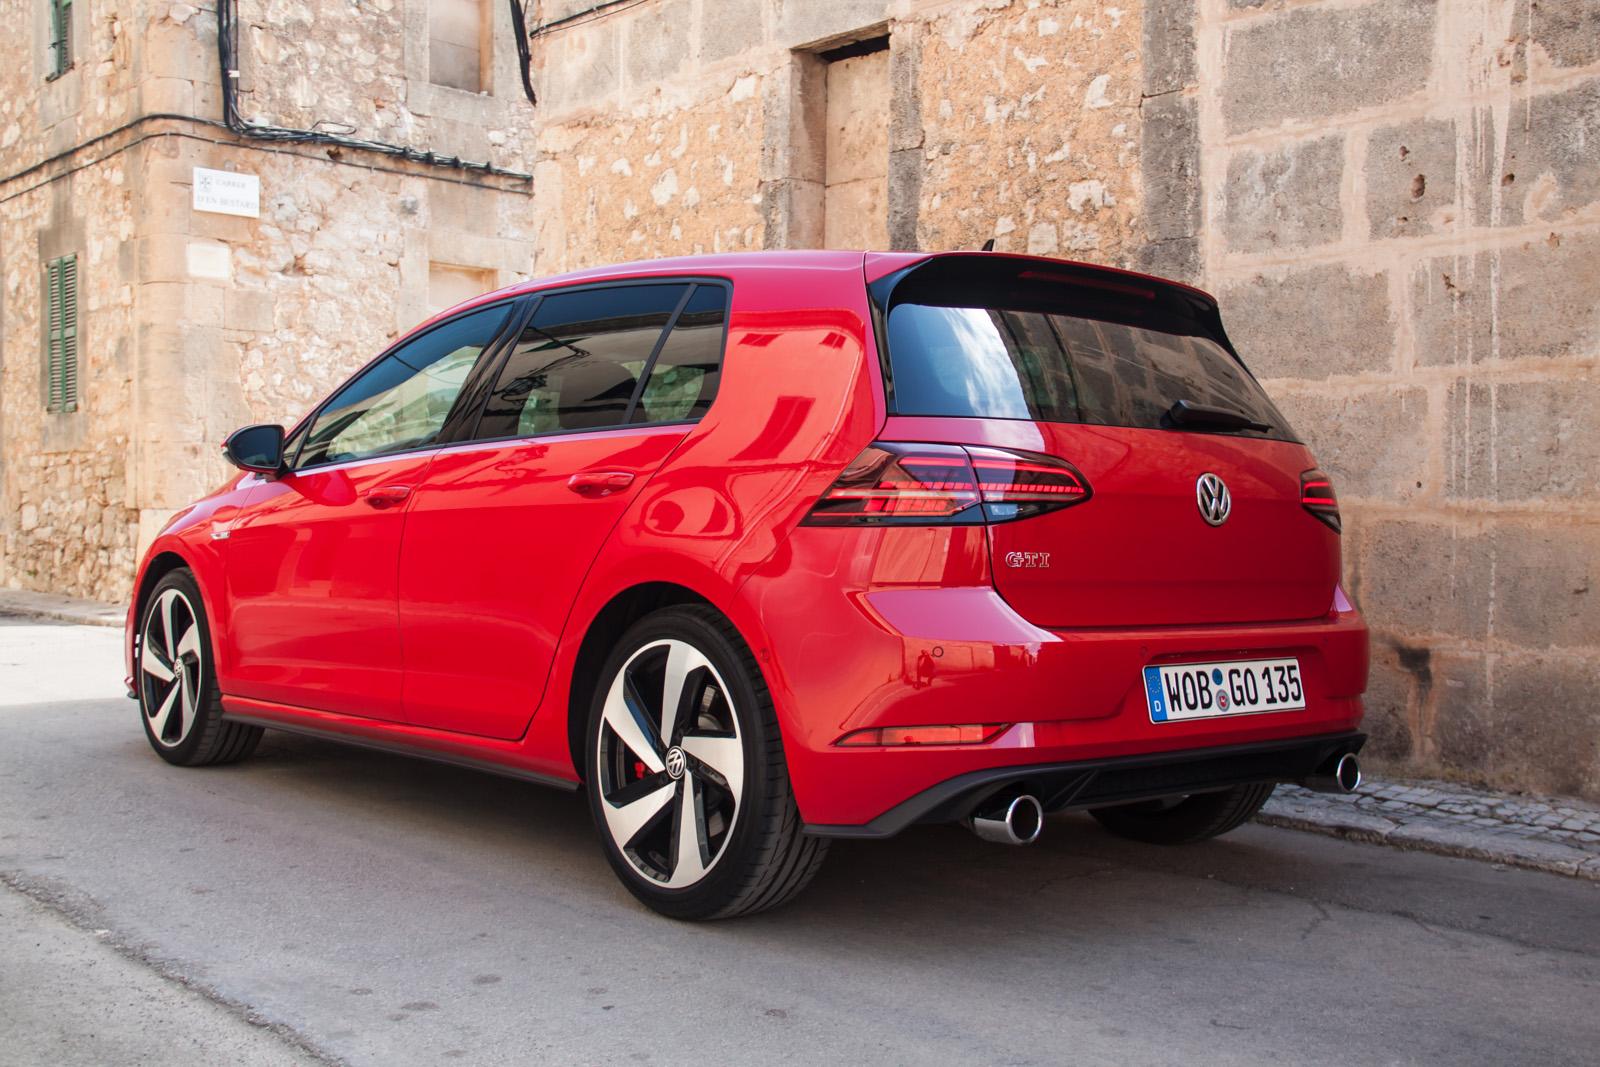 2018 Volkswagen Gti Modren Volkswagen 2018 Volkswagen